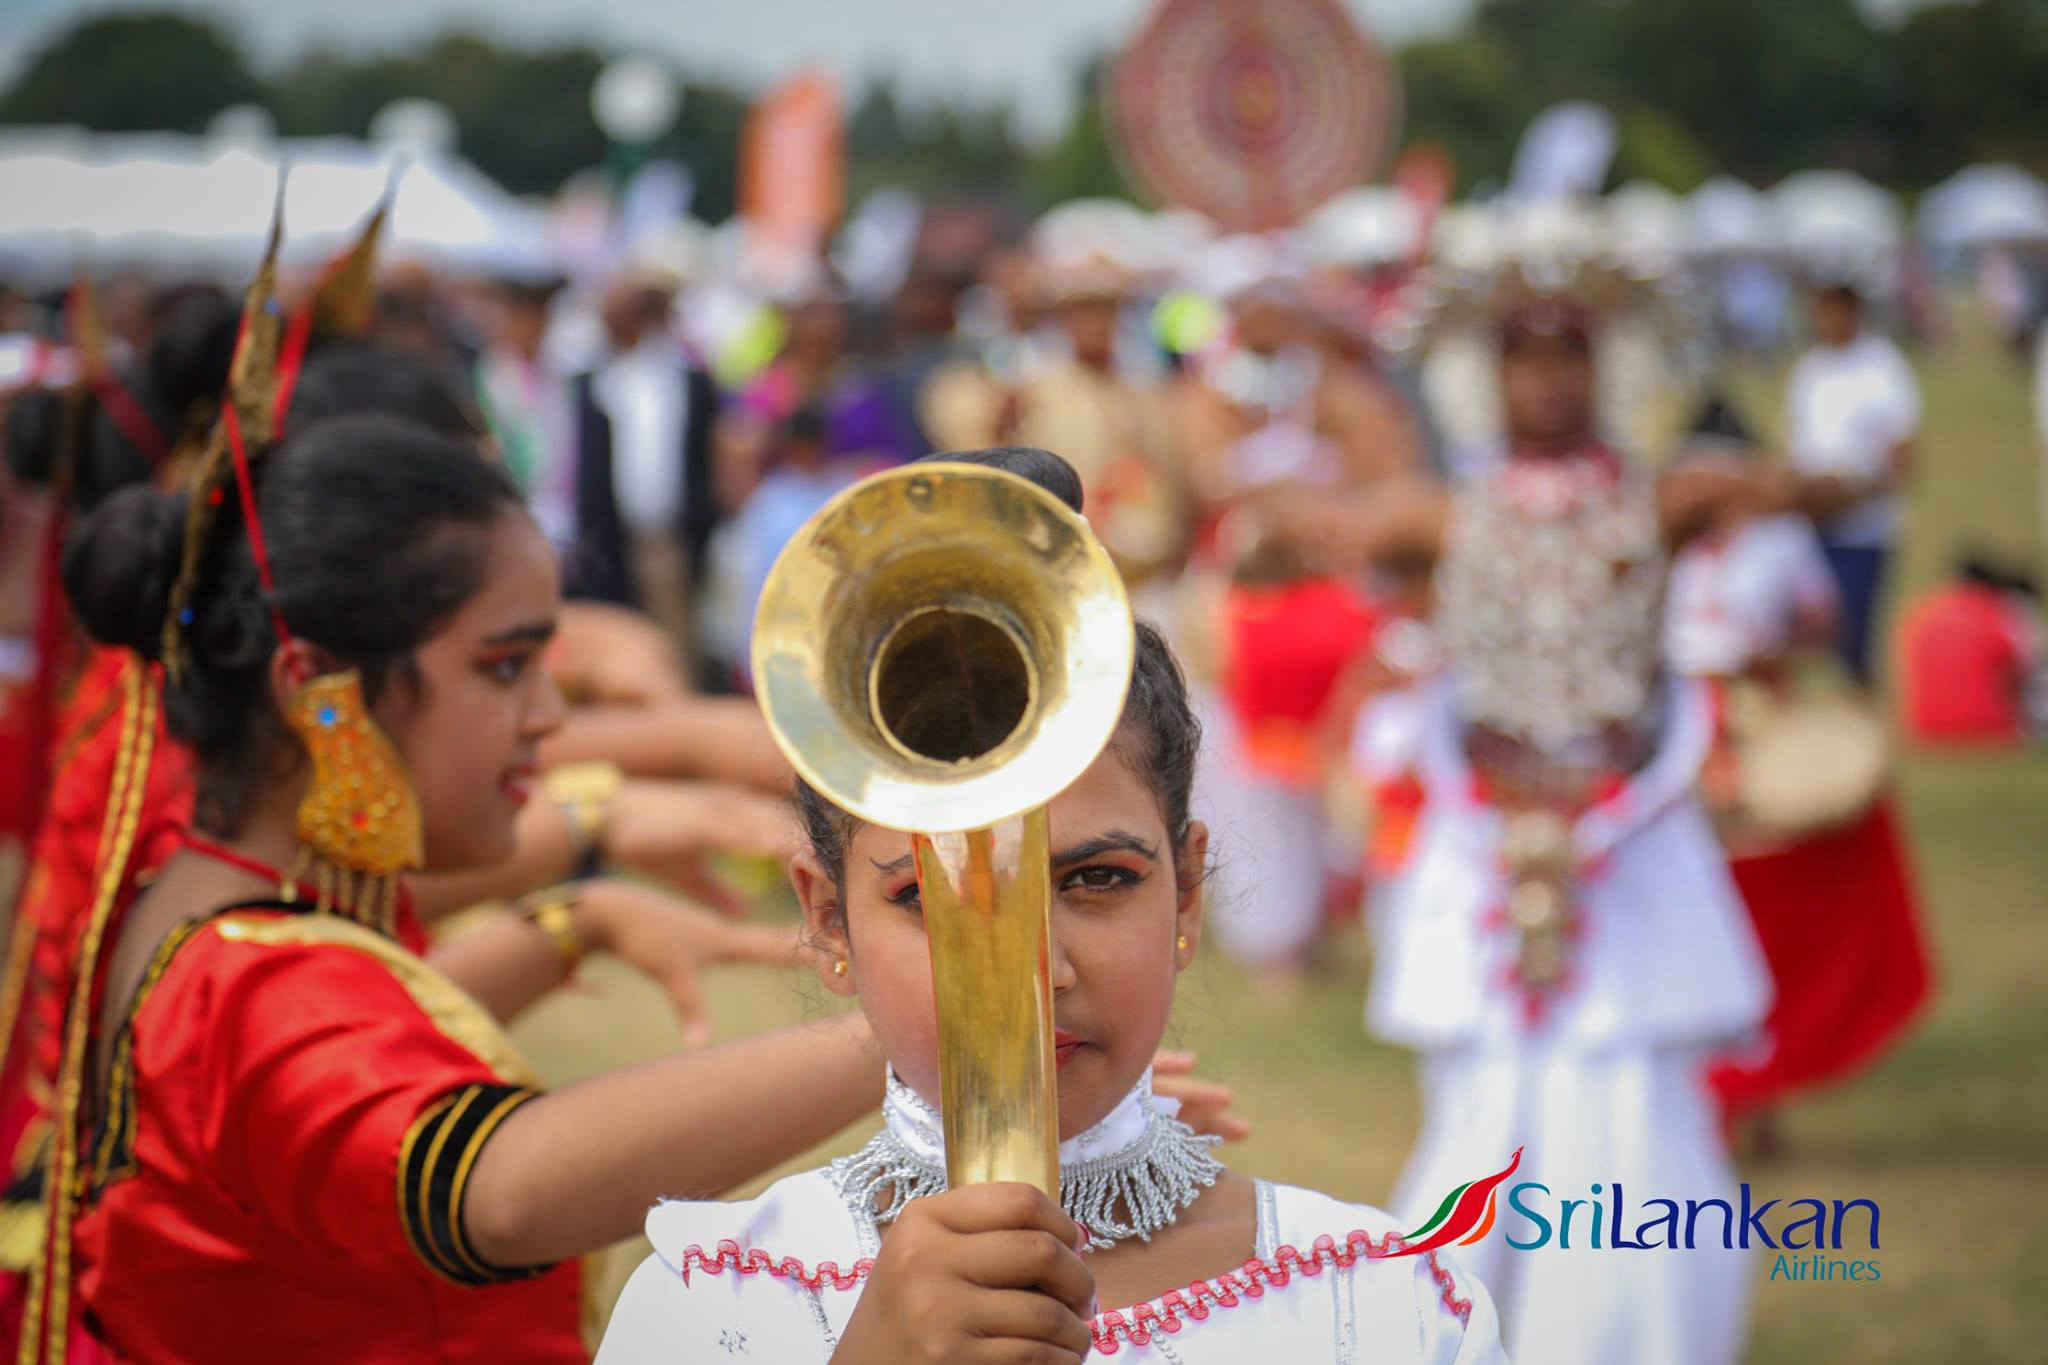 Sri-Lankan-airlines-cricket-festival-london-2017-natalia-smith--photography-13.jpg